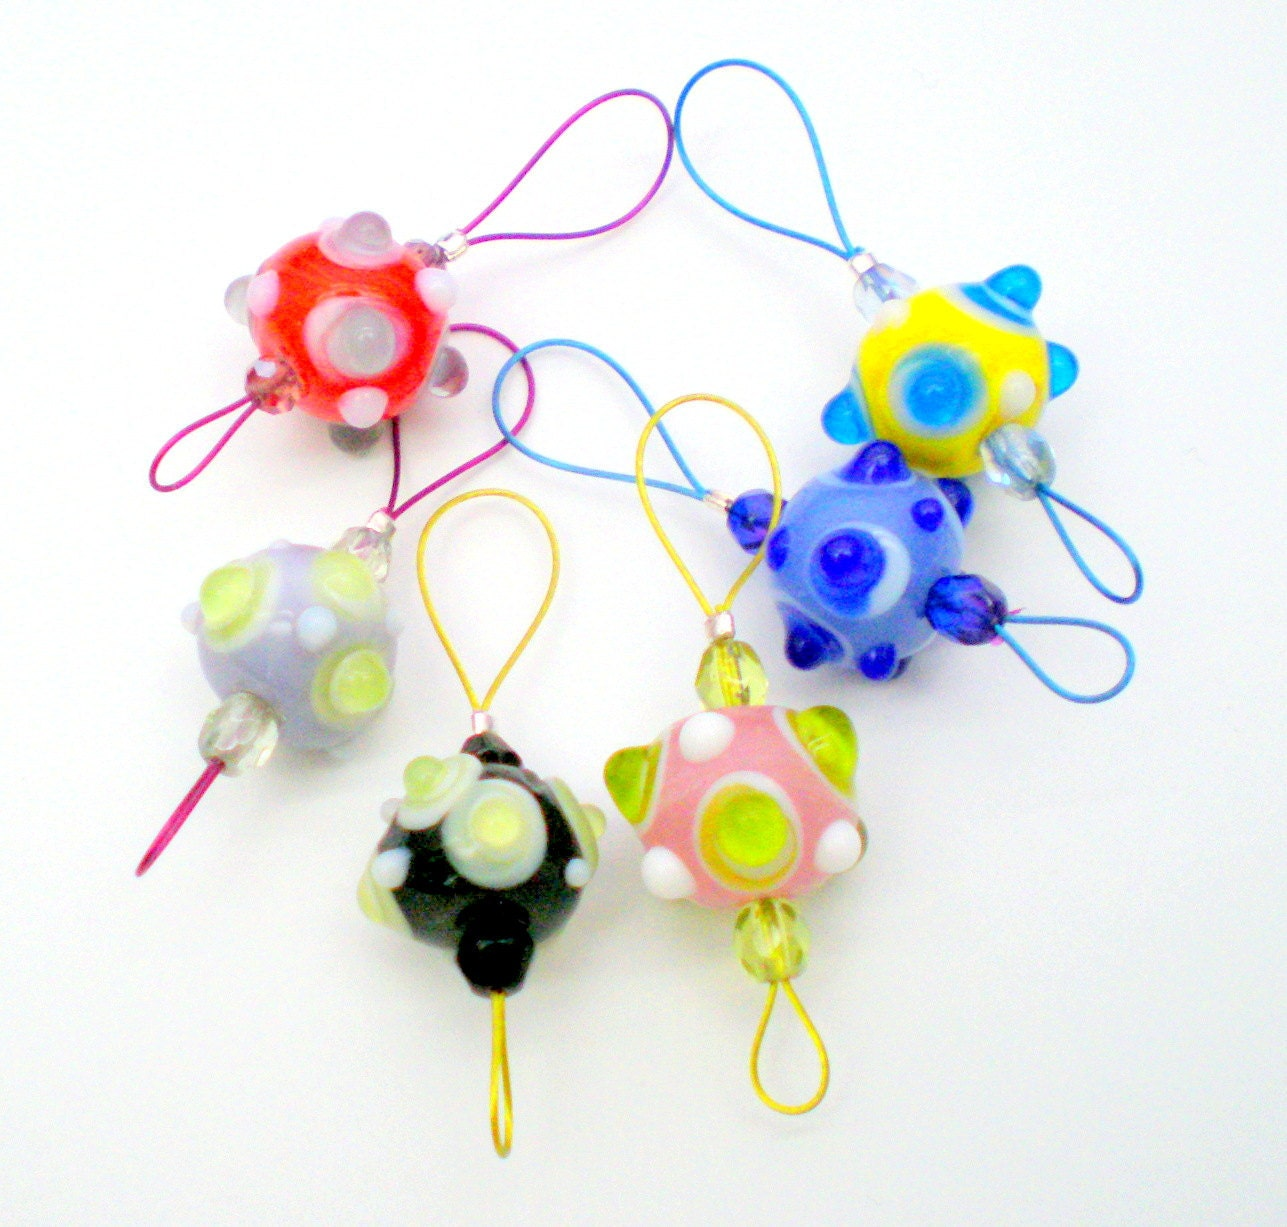 Knitting Markers Beads : Bead knitting stitch markers set of handmade